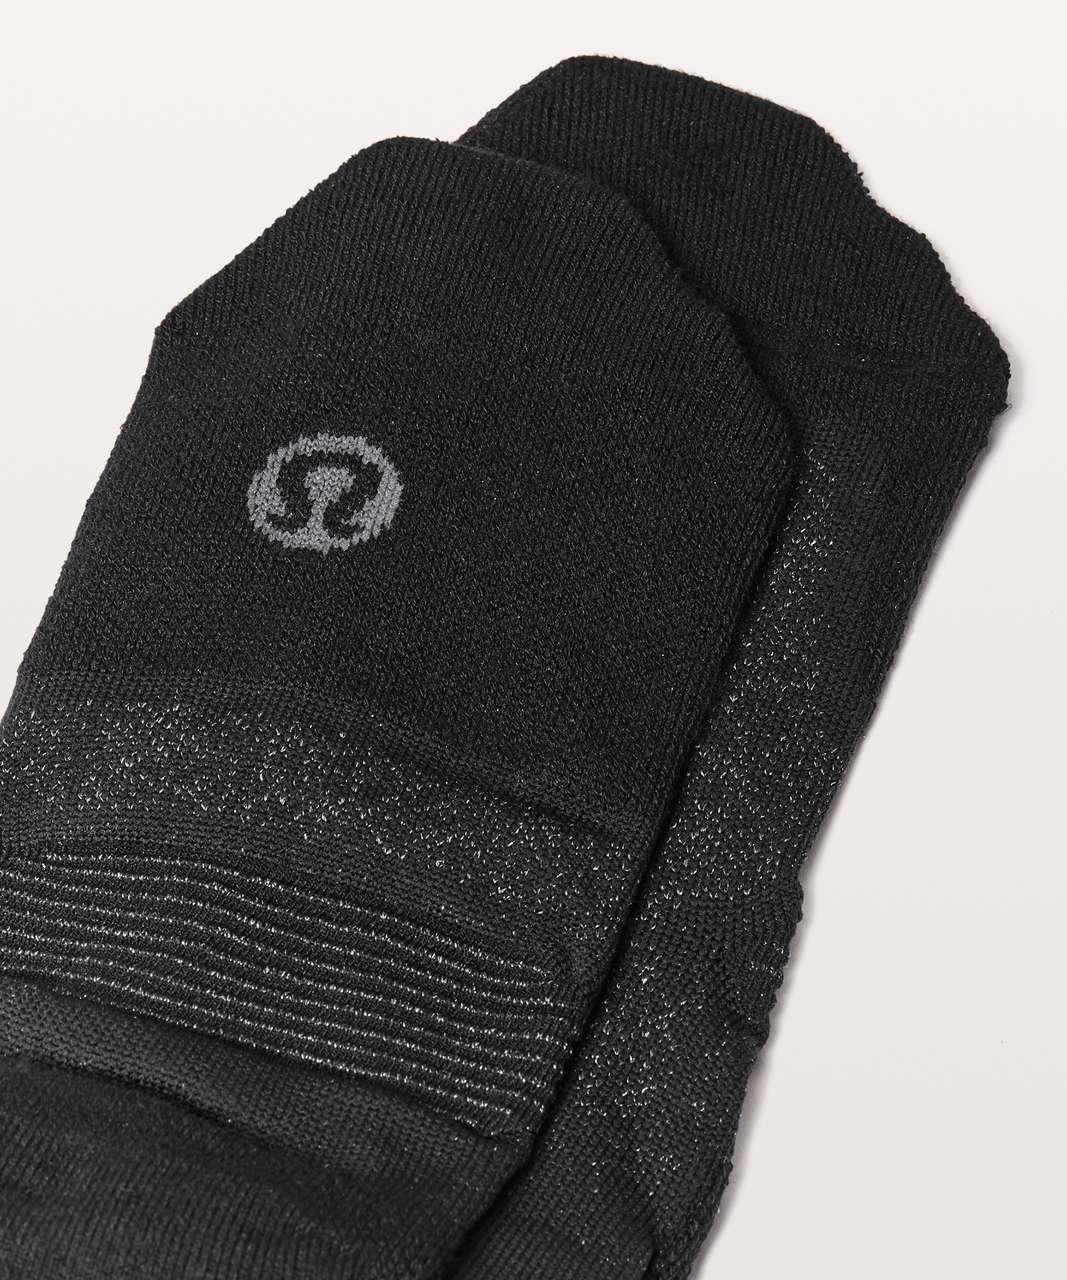 Lululemon Speed Sock *Silver - Black (Third Release)